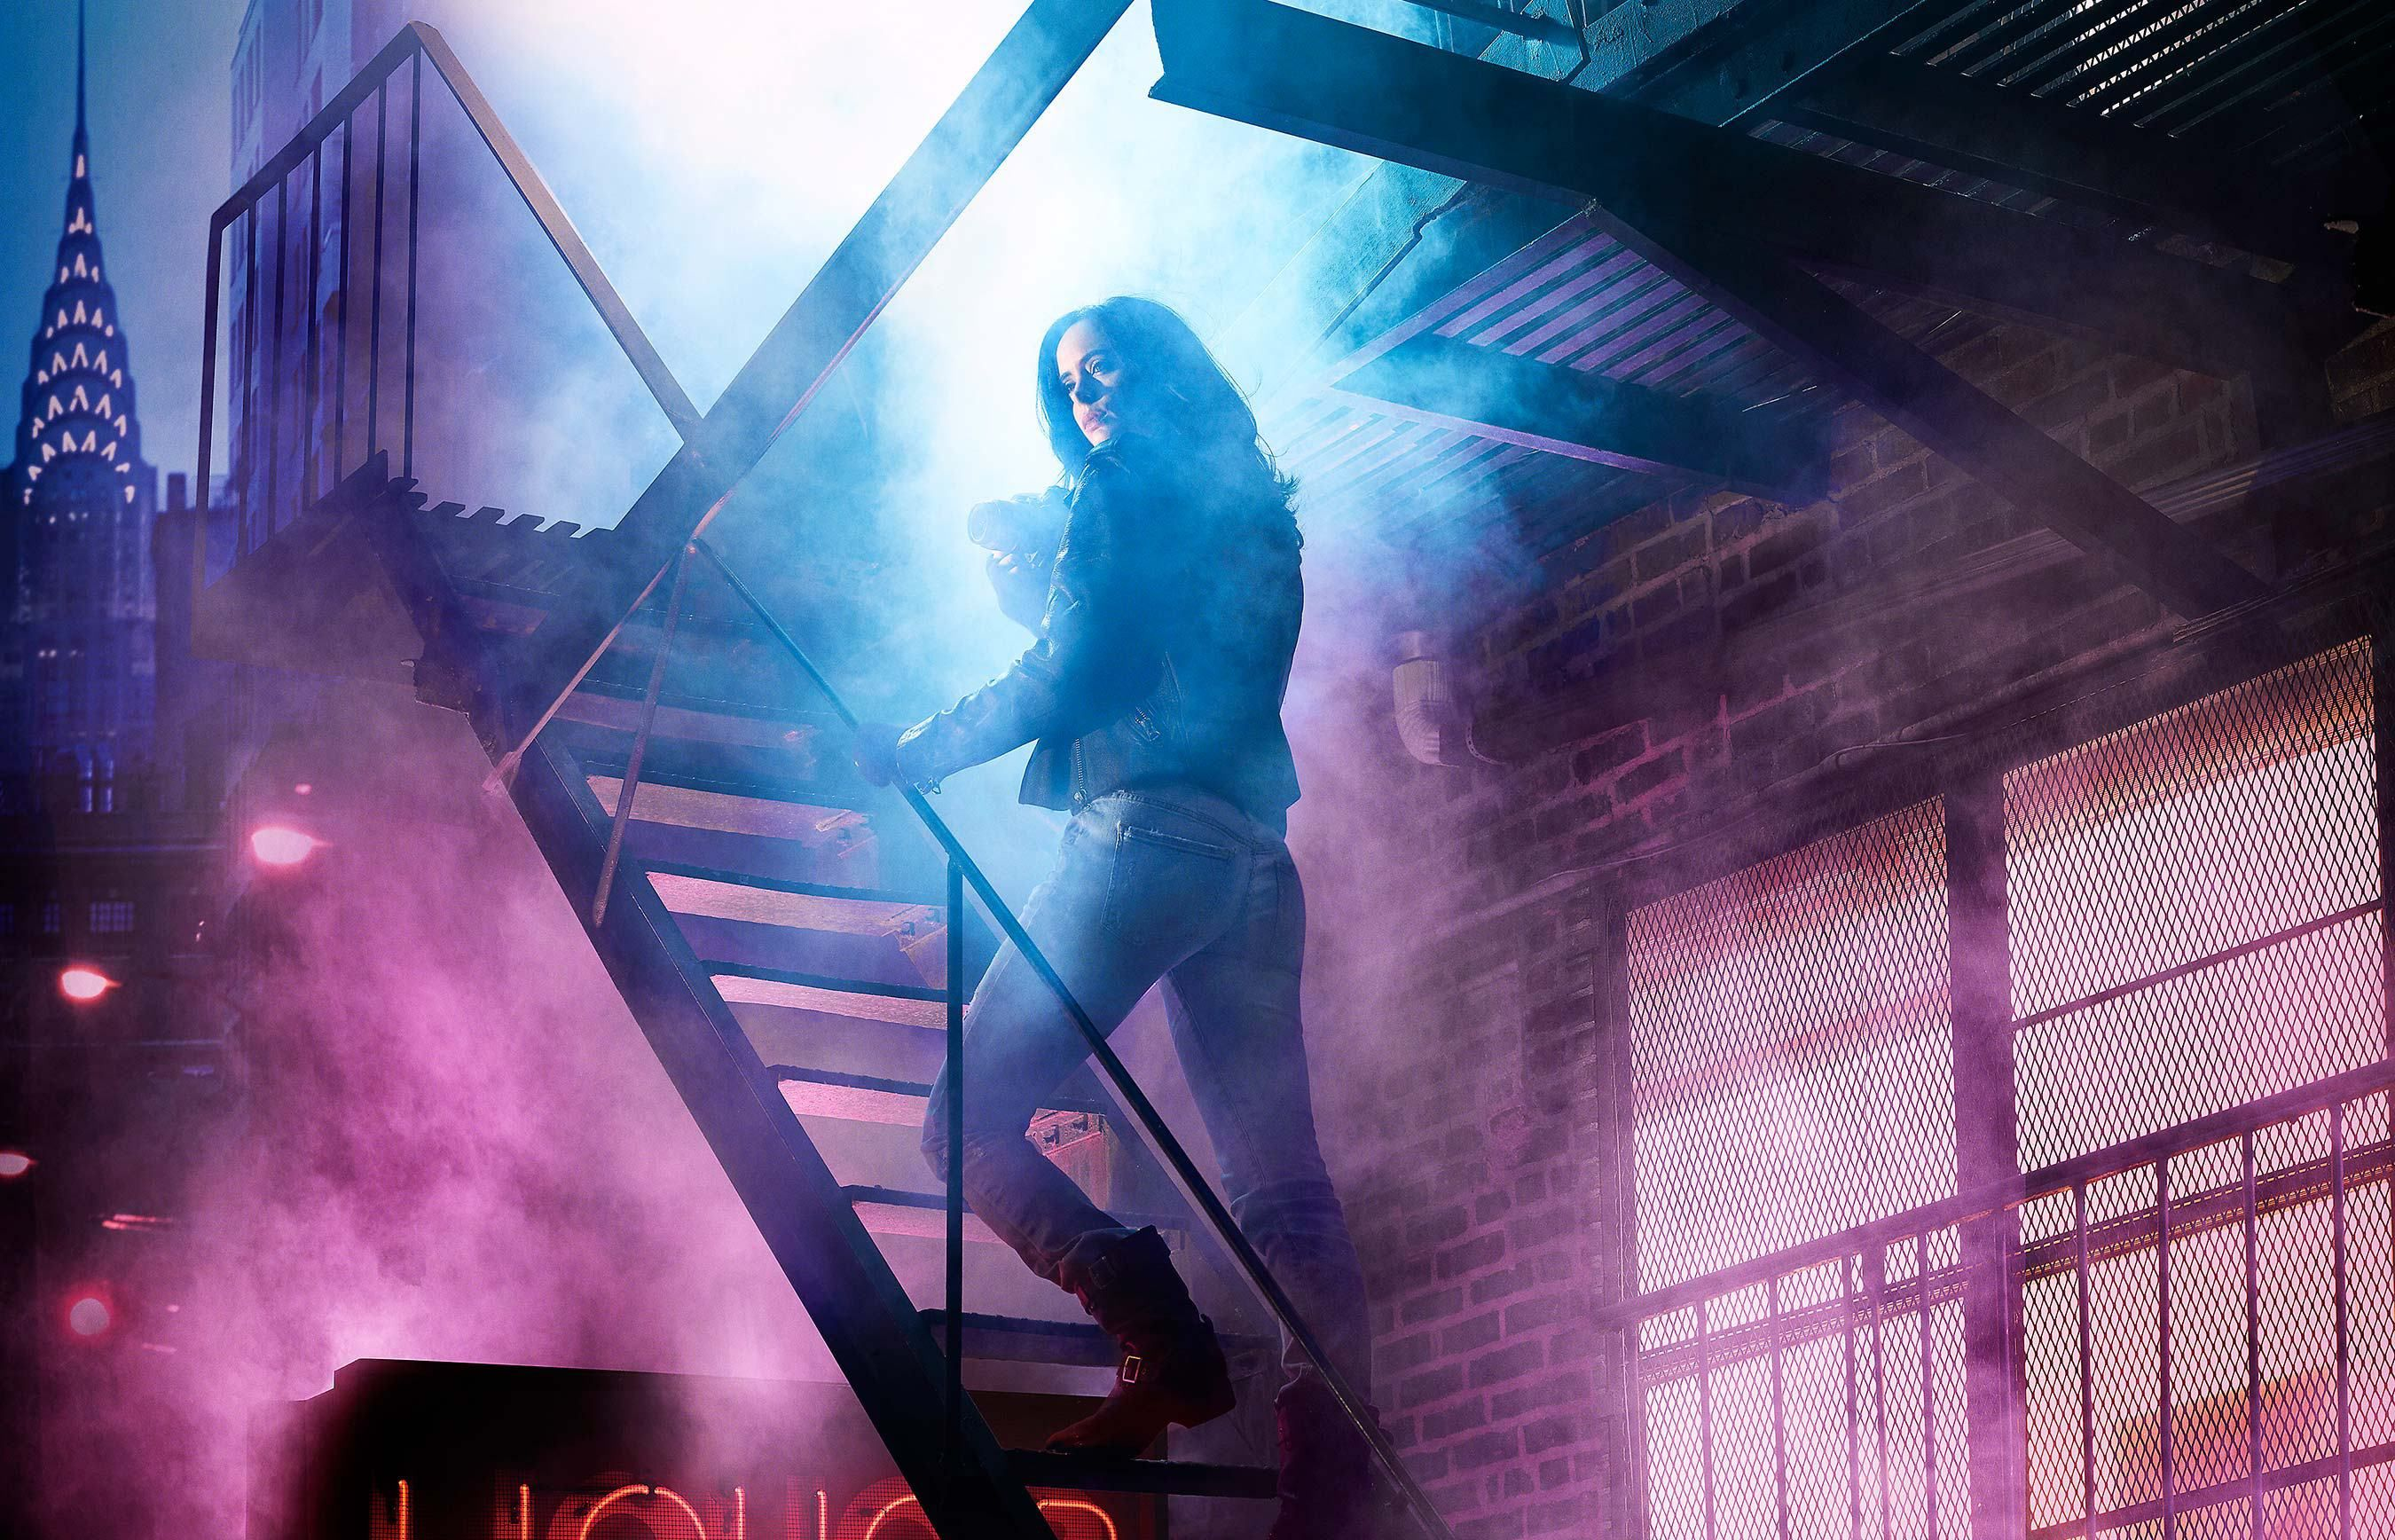 Jessica Jones Fondo De Pantalla Hd Fondo De Escritorio